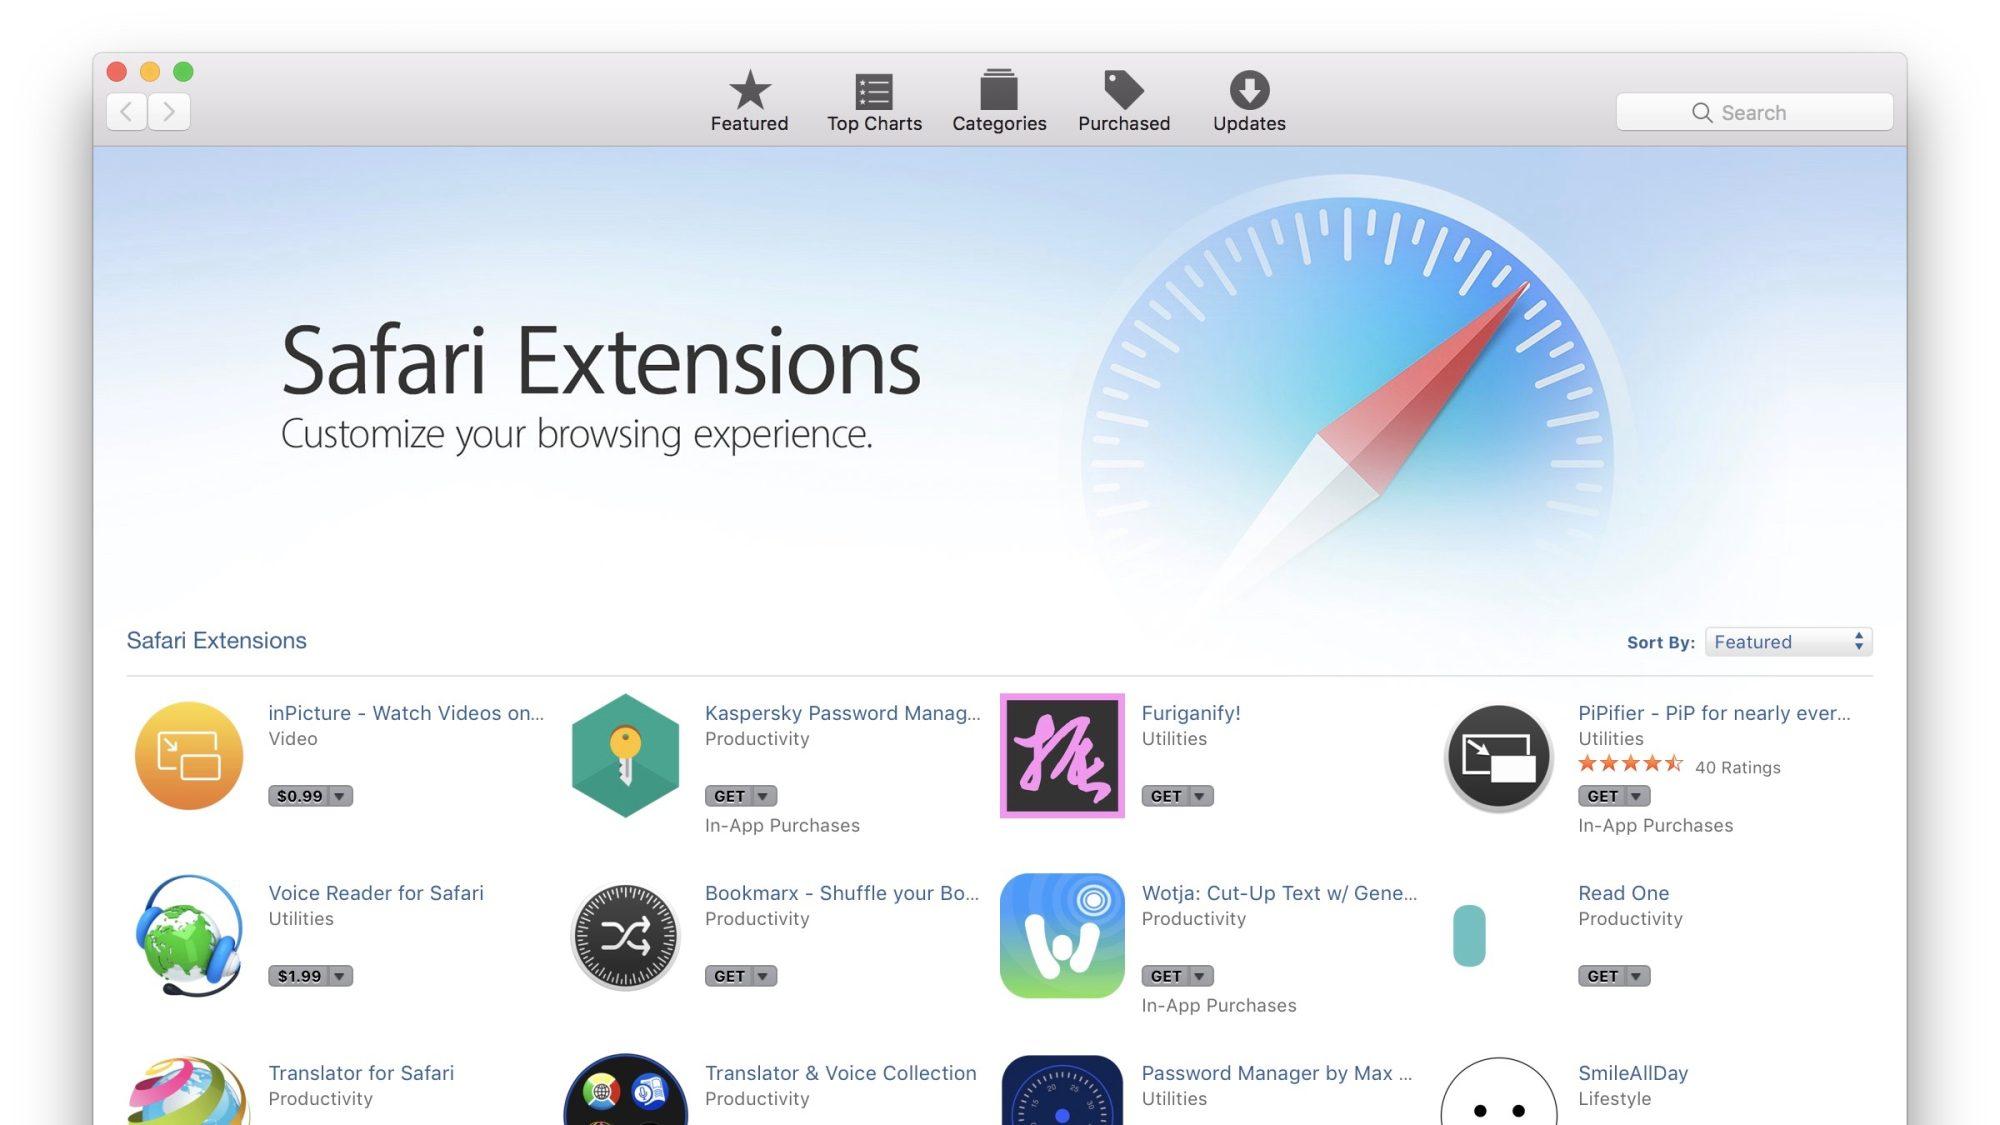 Safari Extensions Webpage